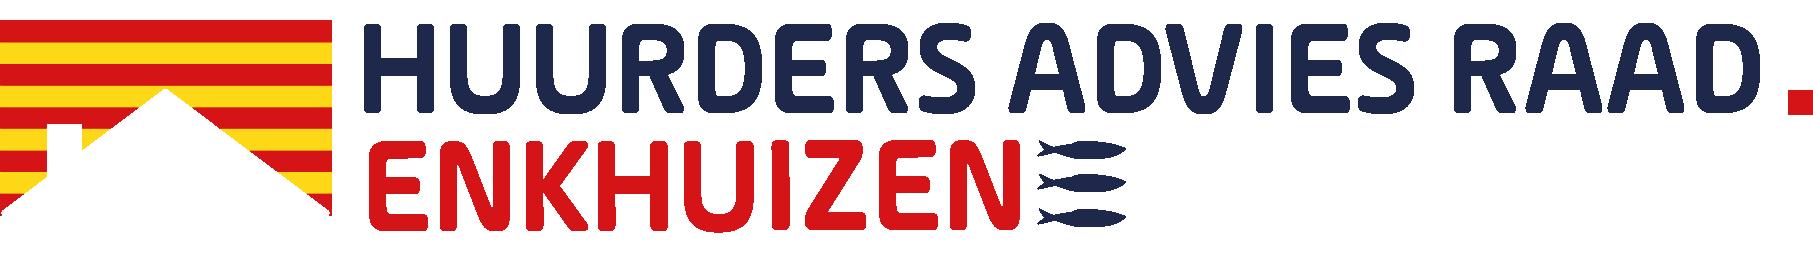 Huurders Advies Raad Enkhuizen